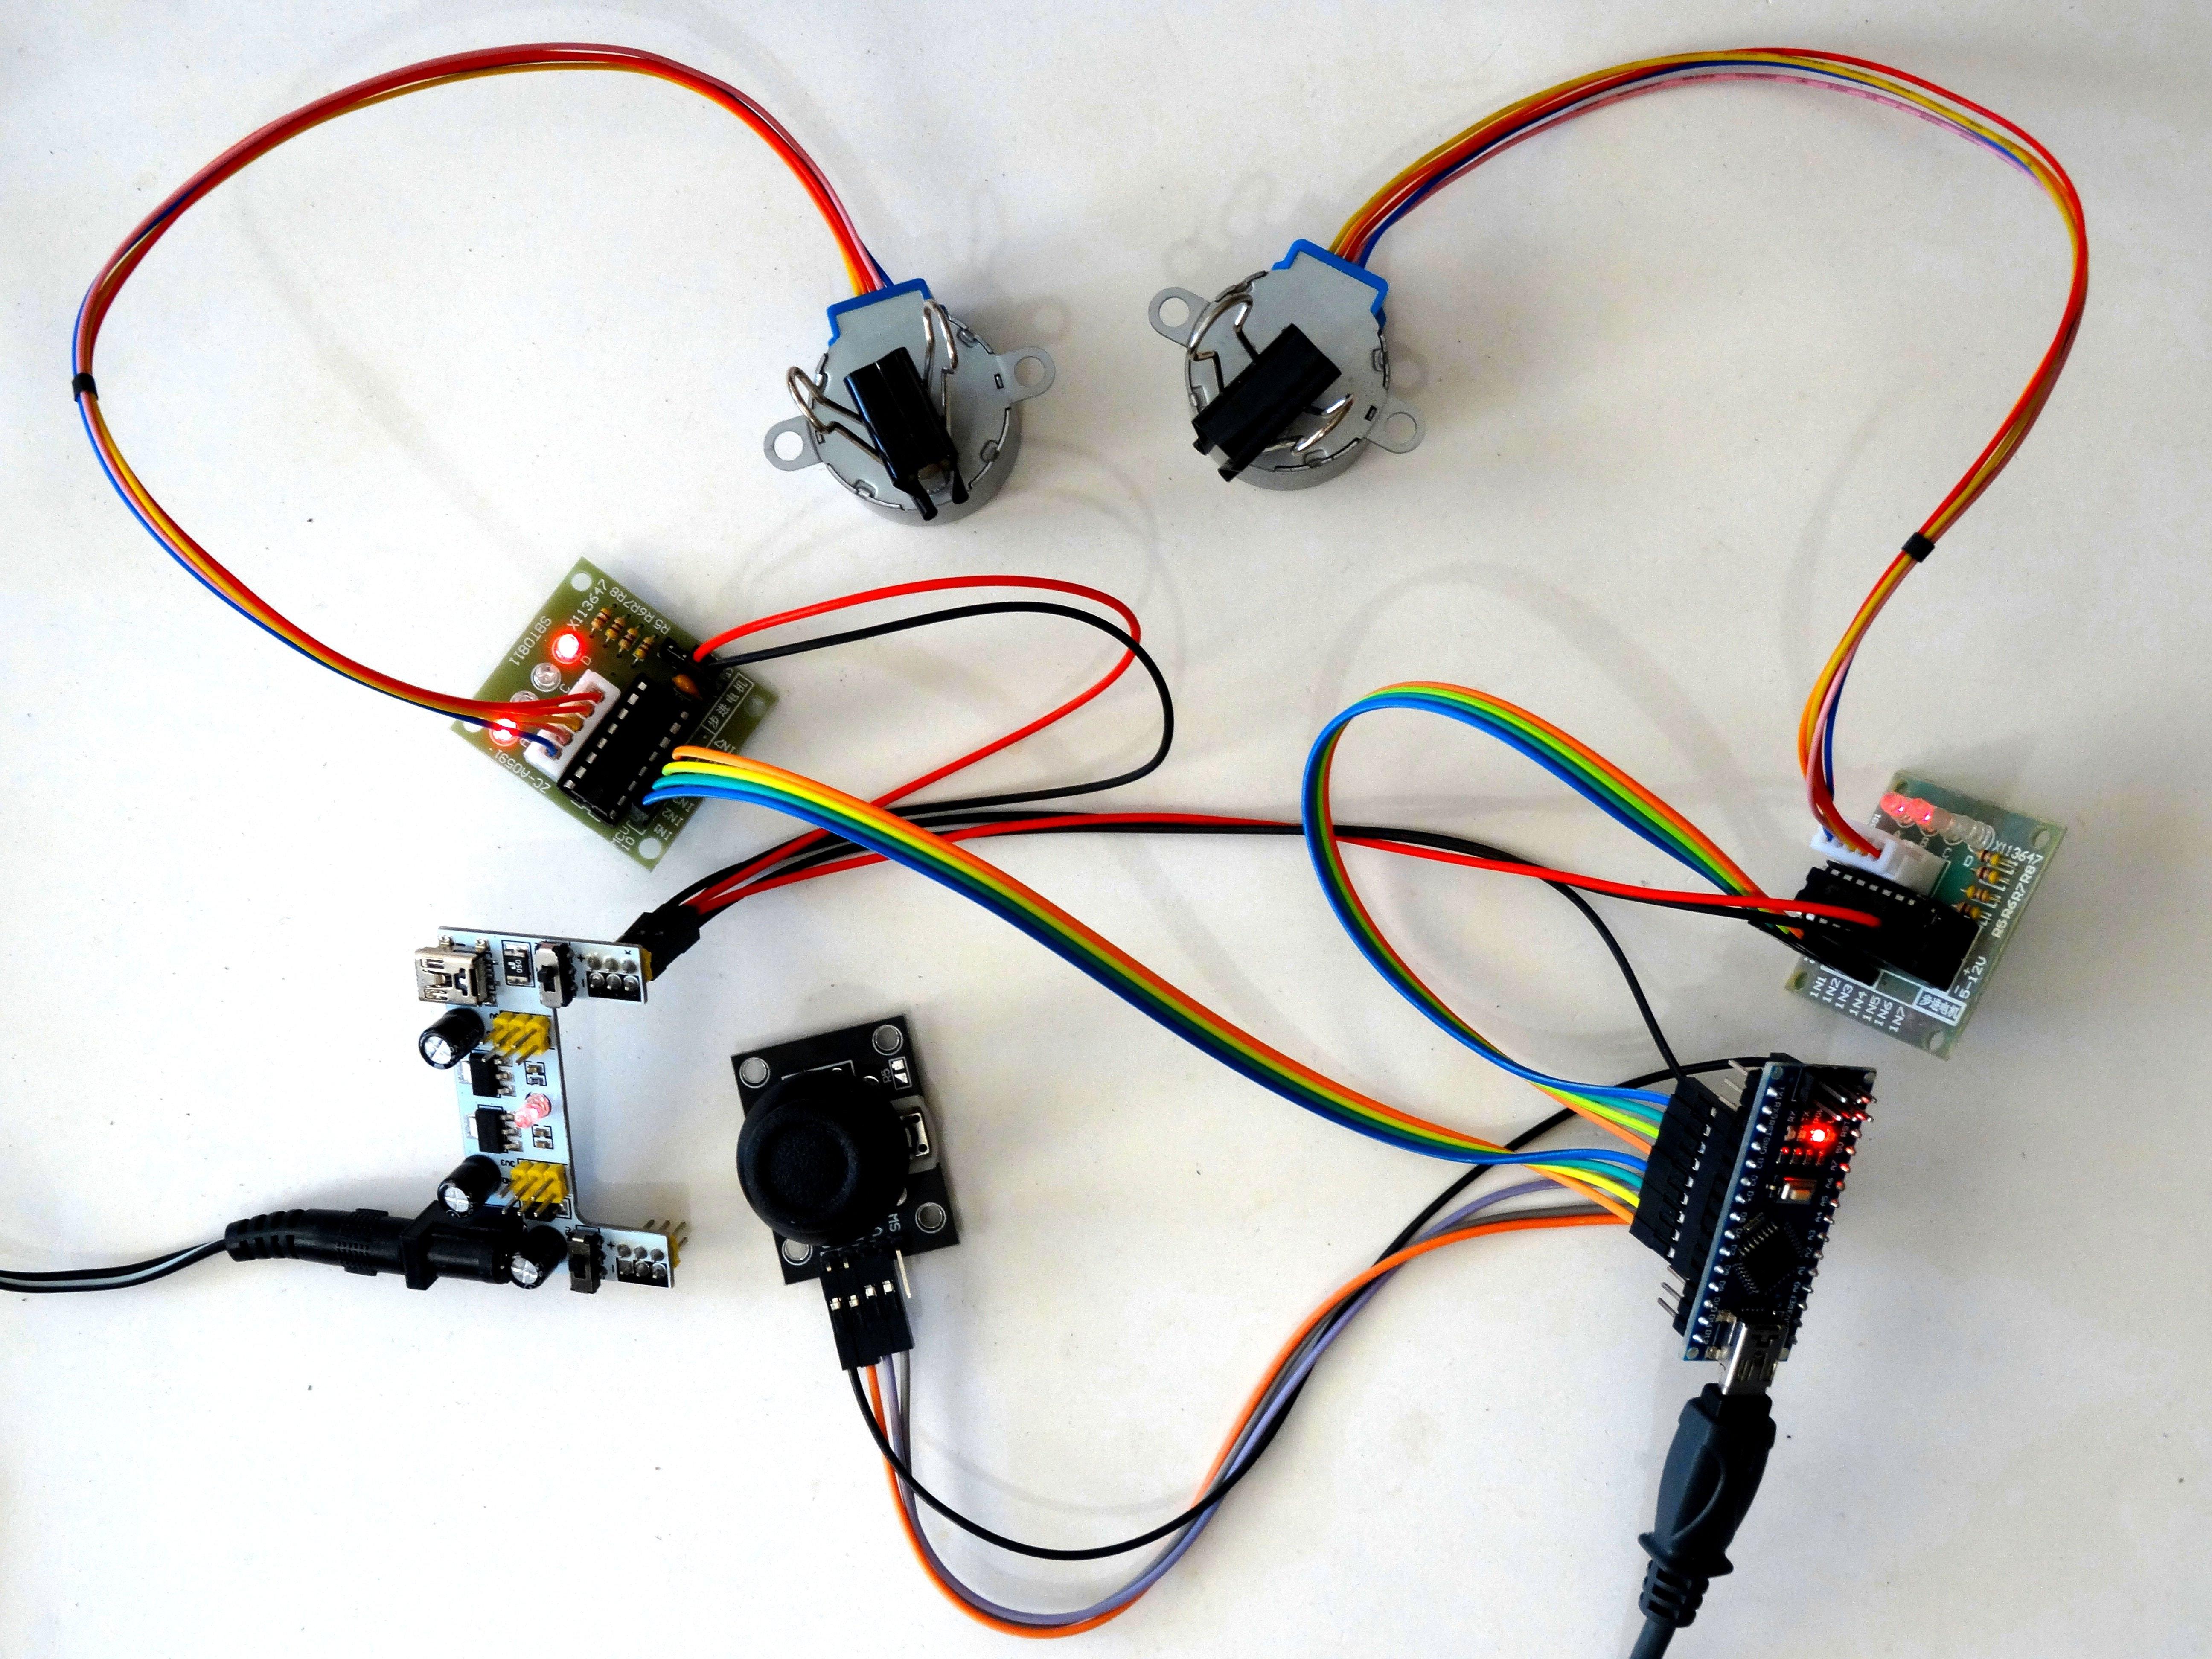 arduino nano control 2 stepper motors with joystick hackster io rh hackster io Xbox 360 Joystick Wireing Western Joystick Controller